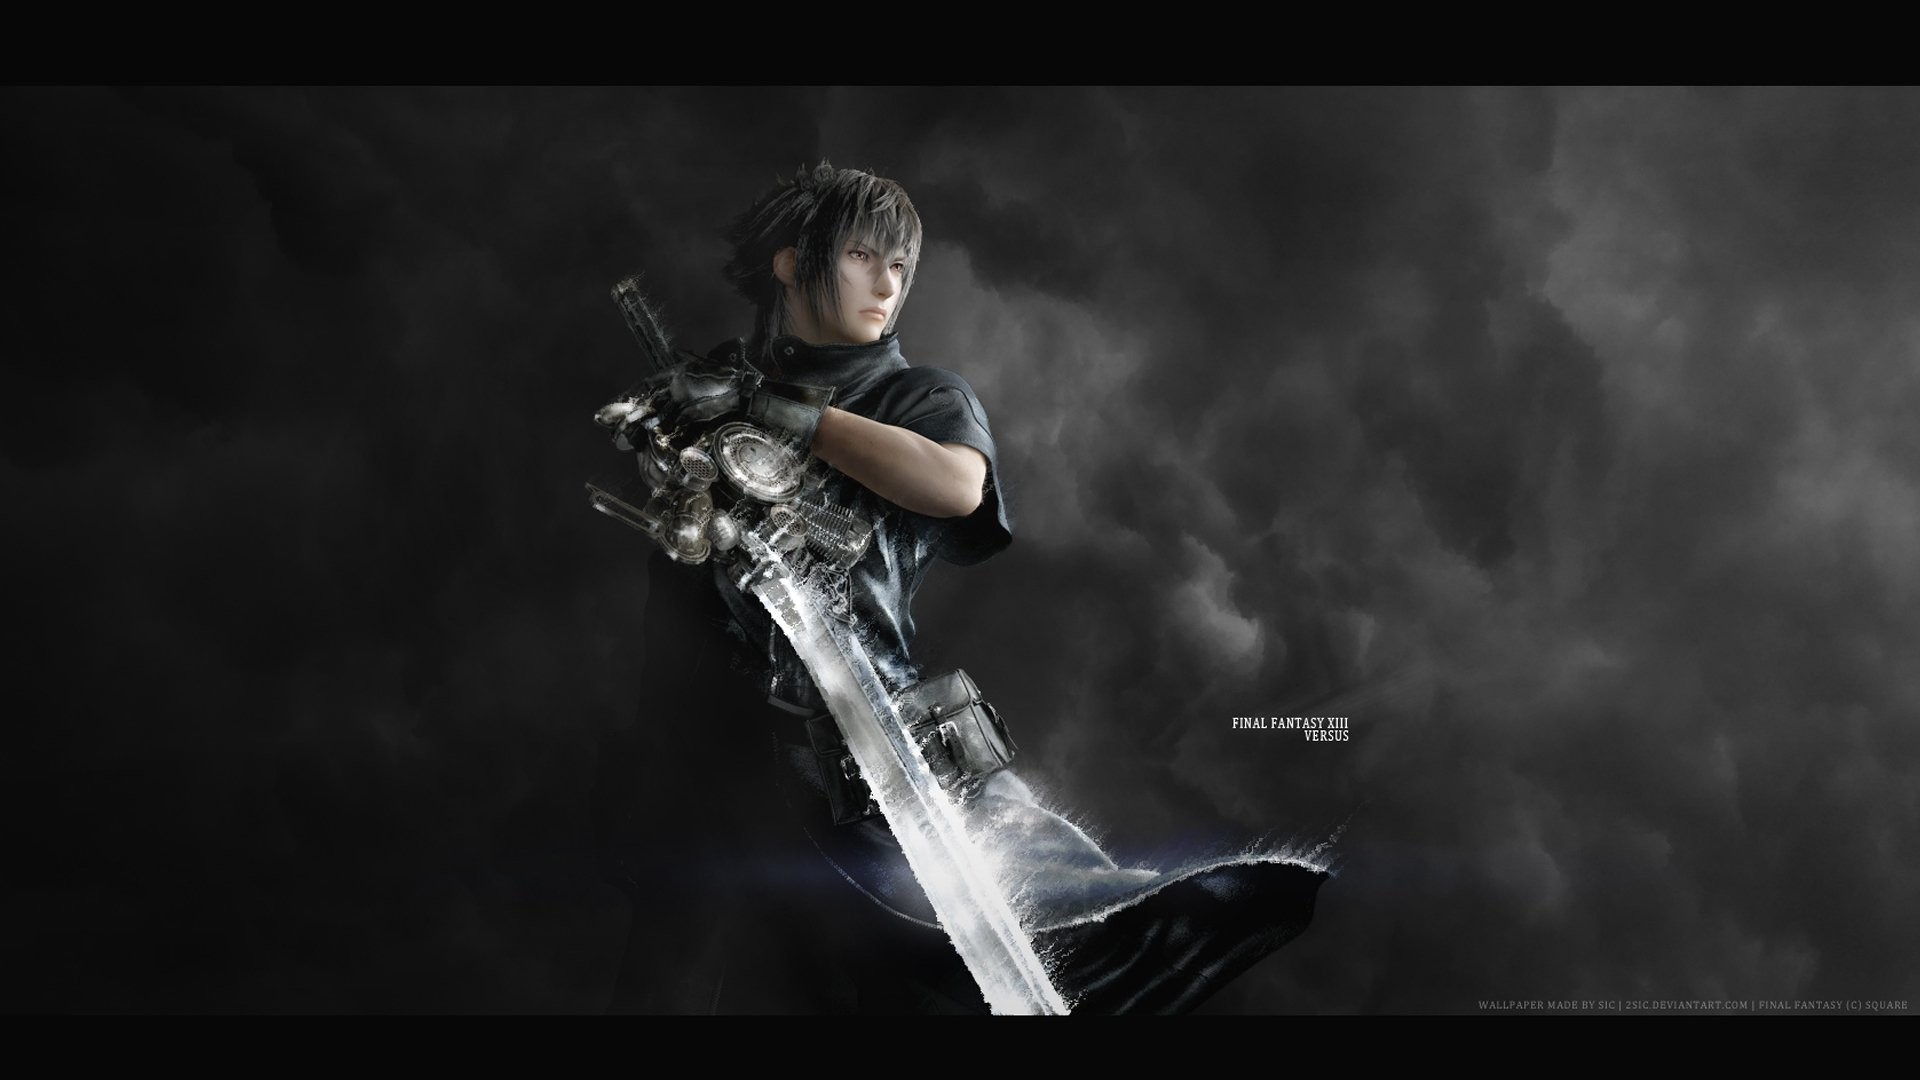 Final Fantasy Hd Wallpaper Wallpapertag